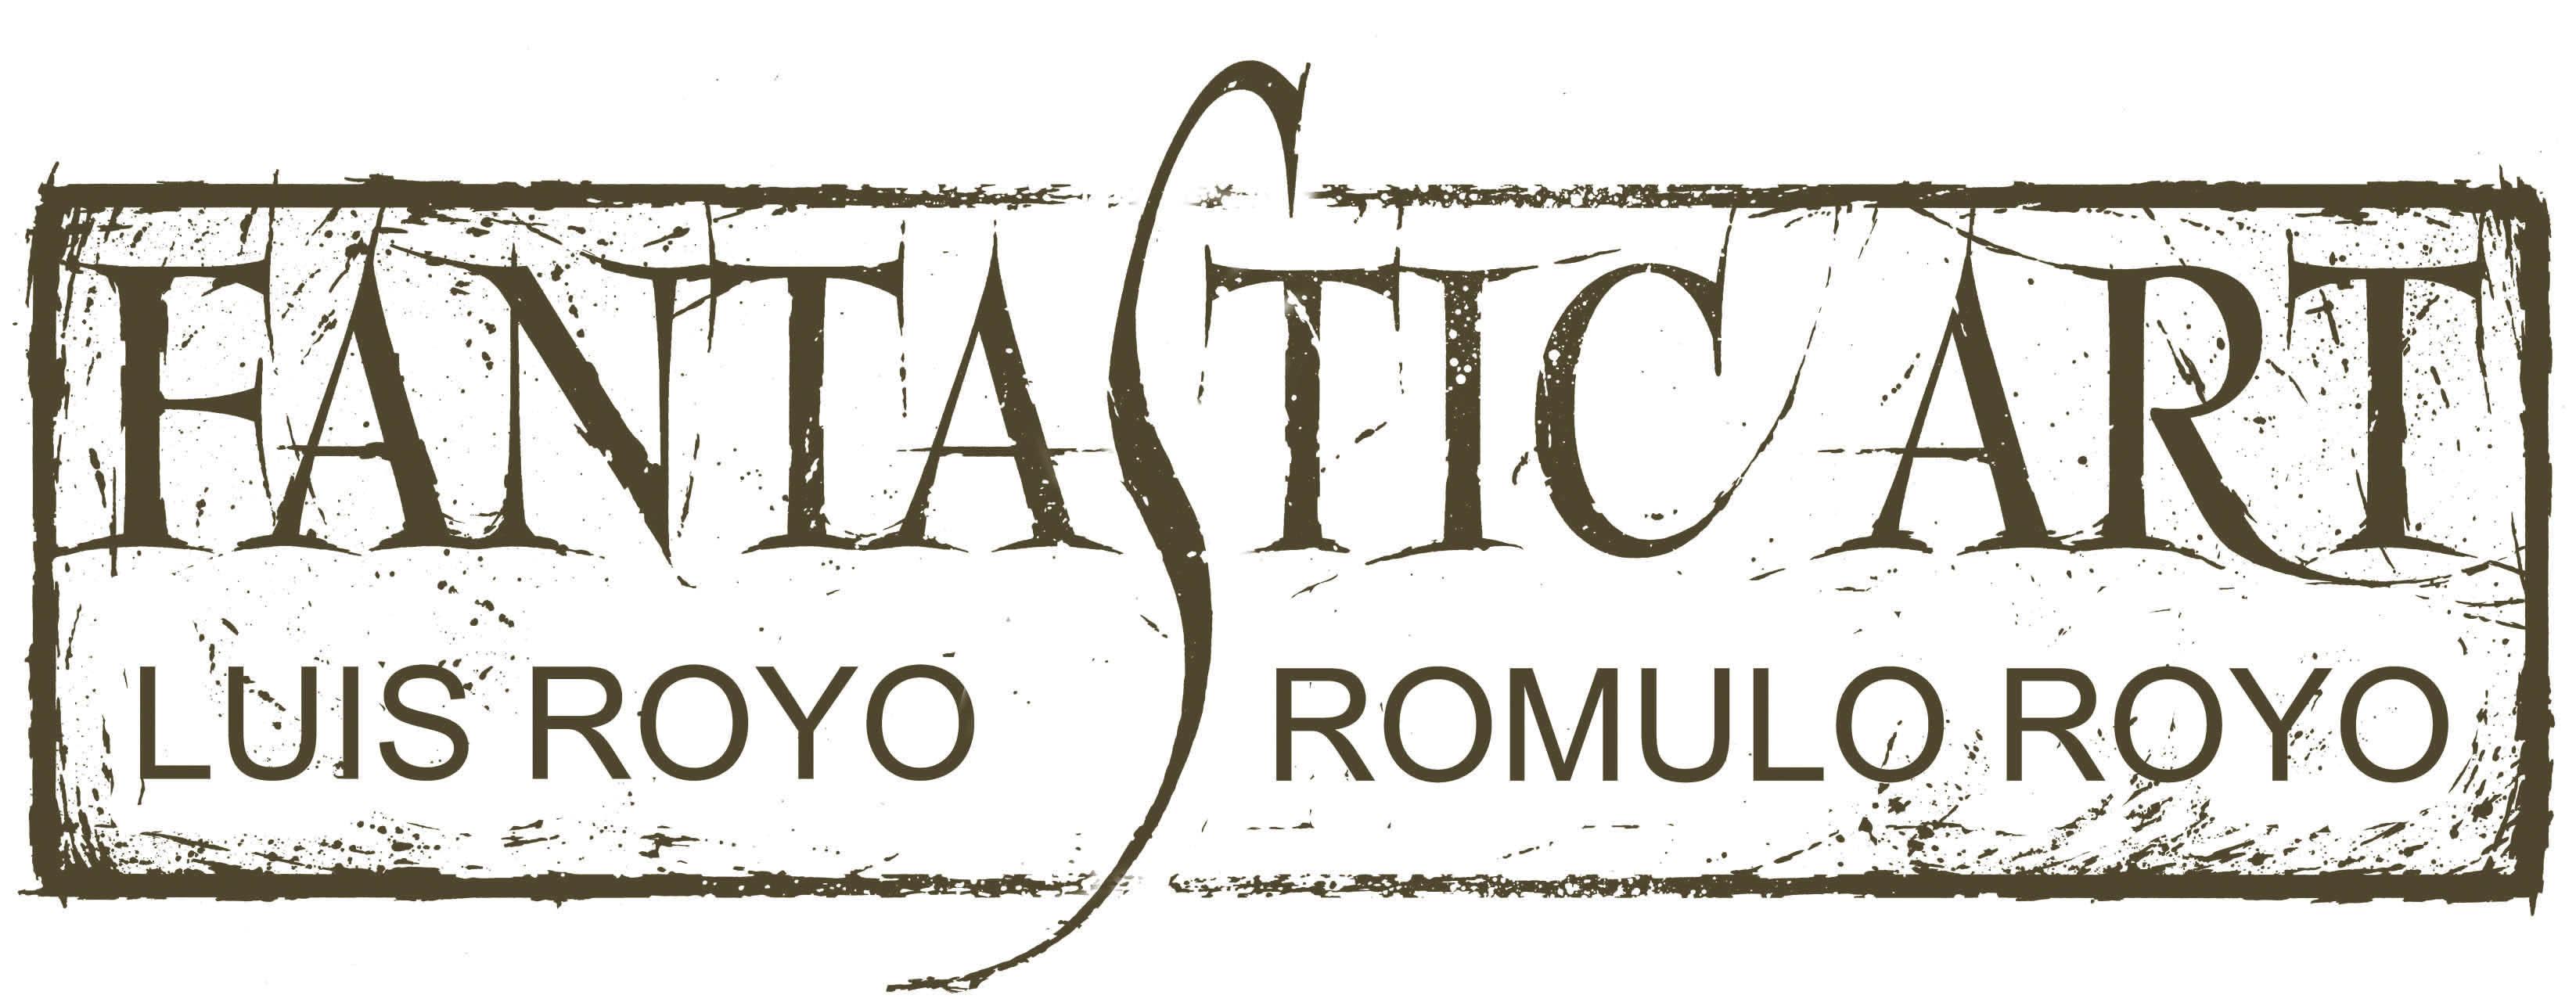 logo new conceptions exhibition